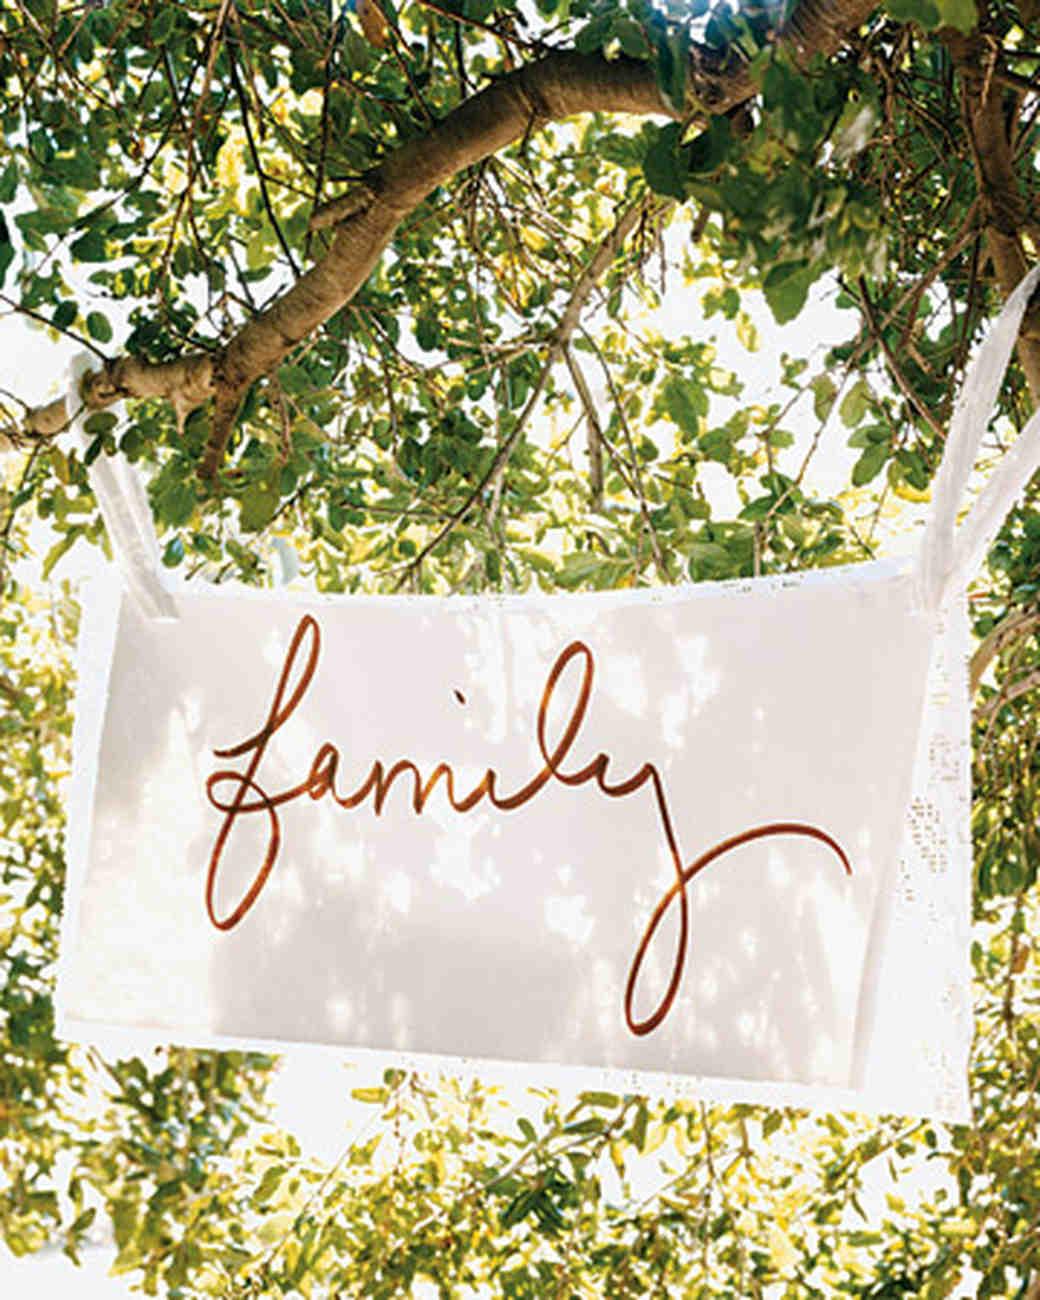 mw1004_fal04_family.jpg